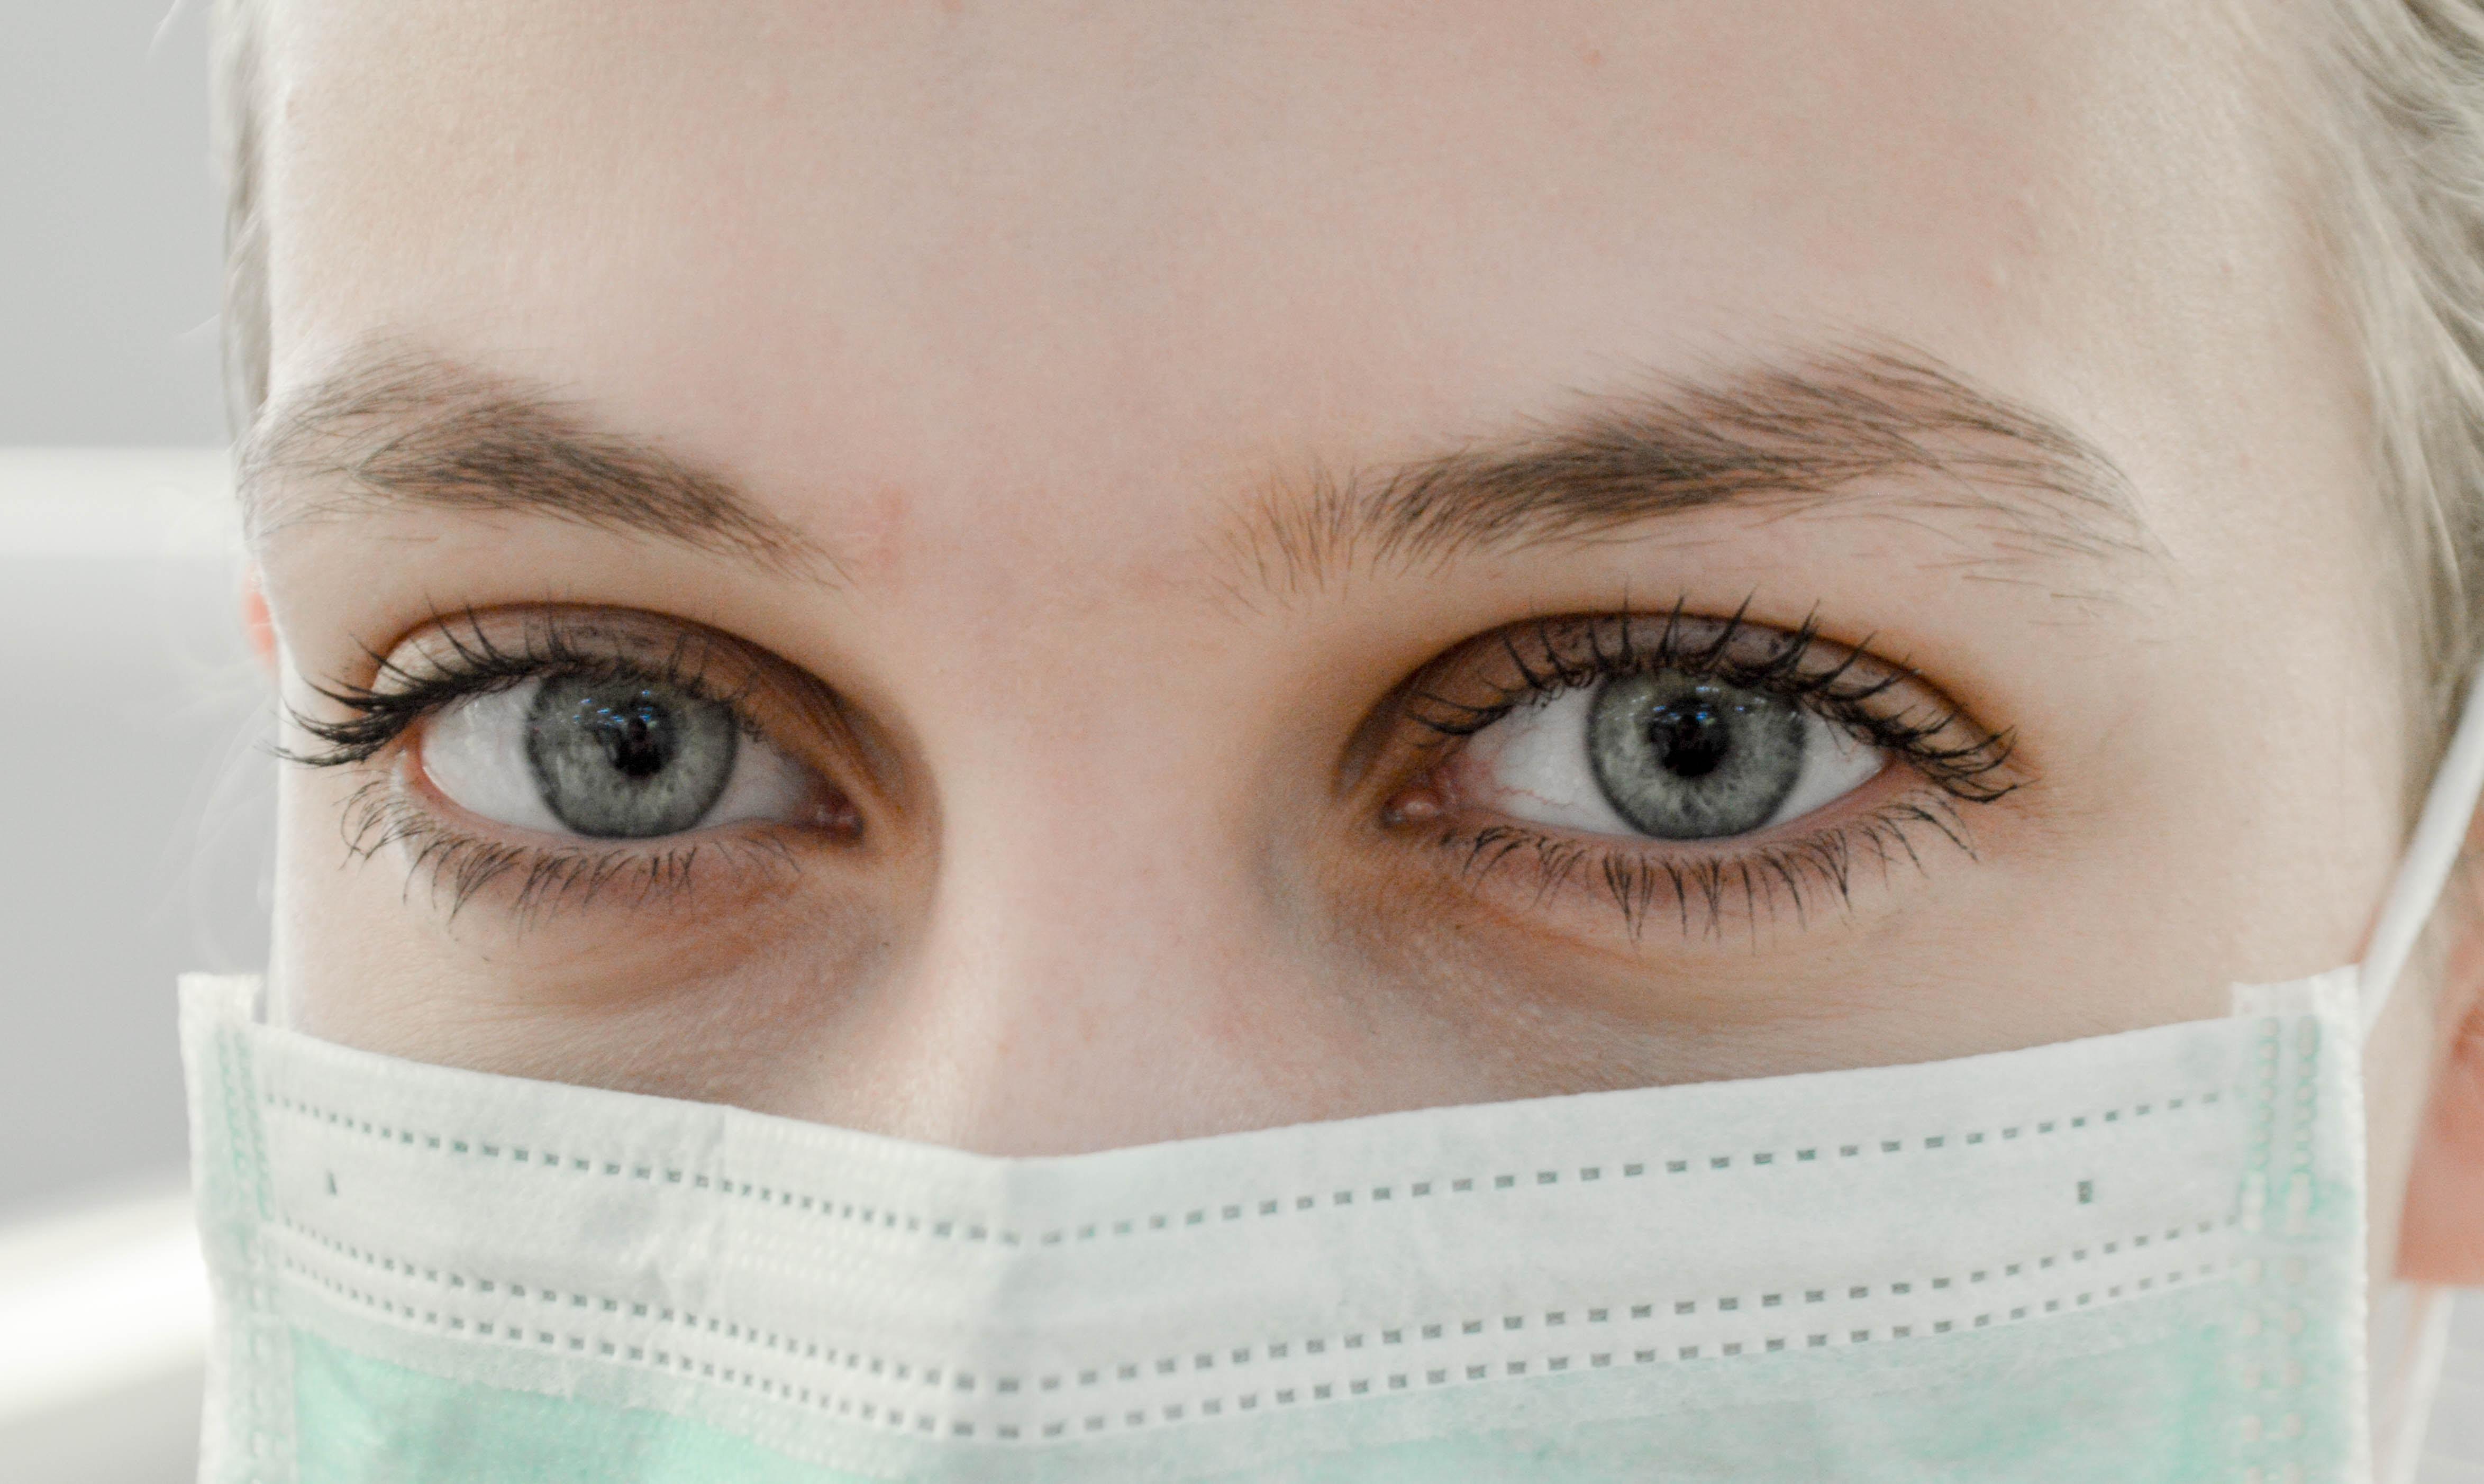 The Stardust-Startup Factory nurse RN